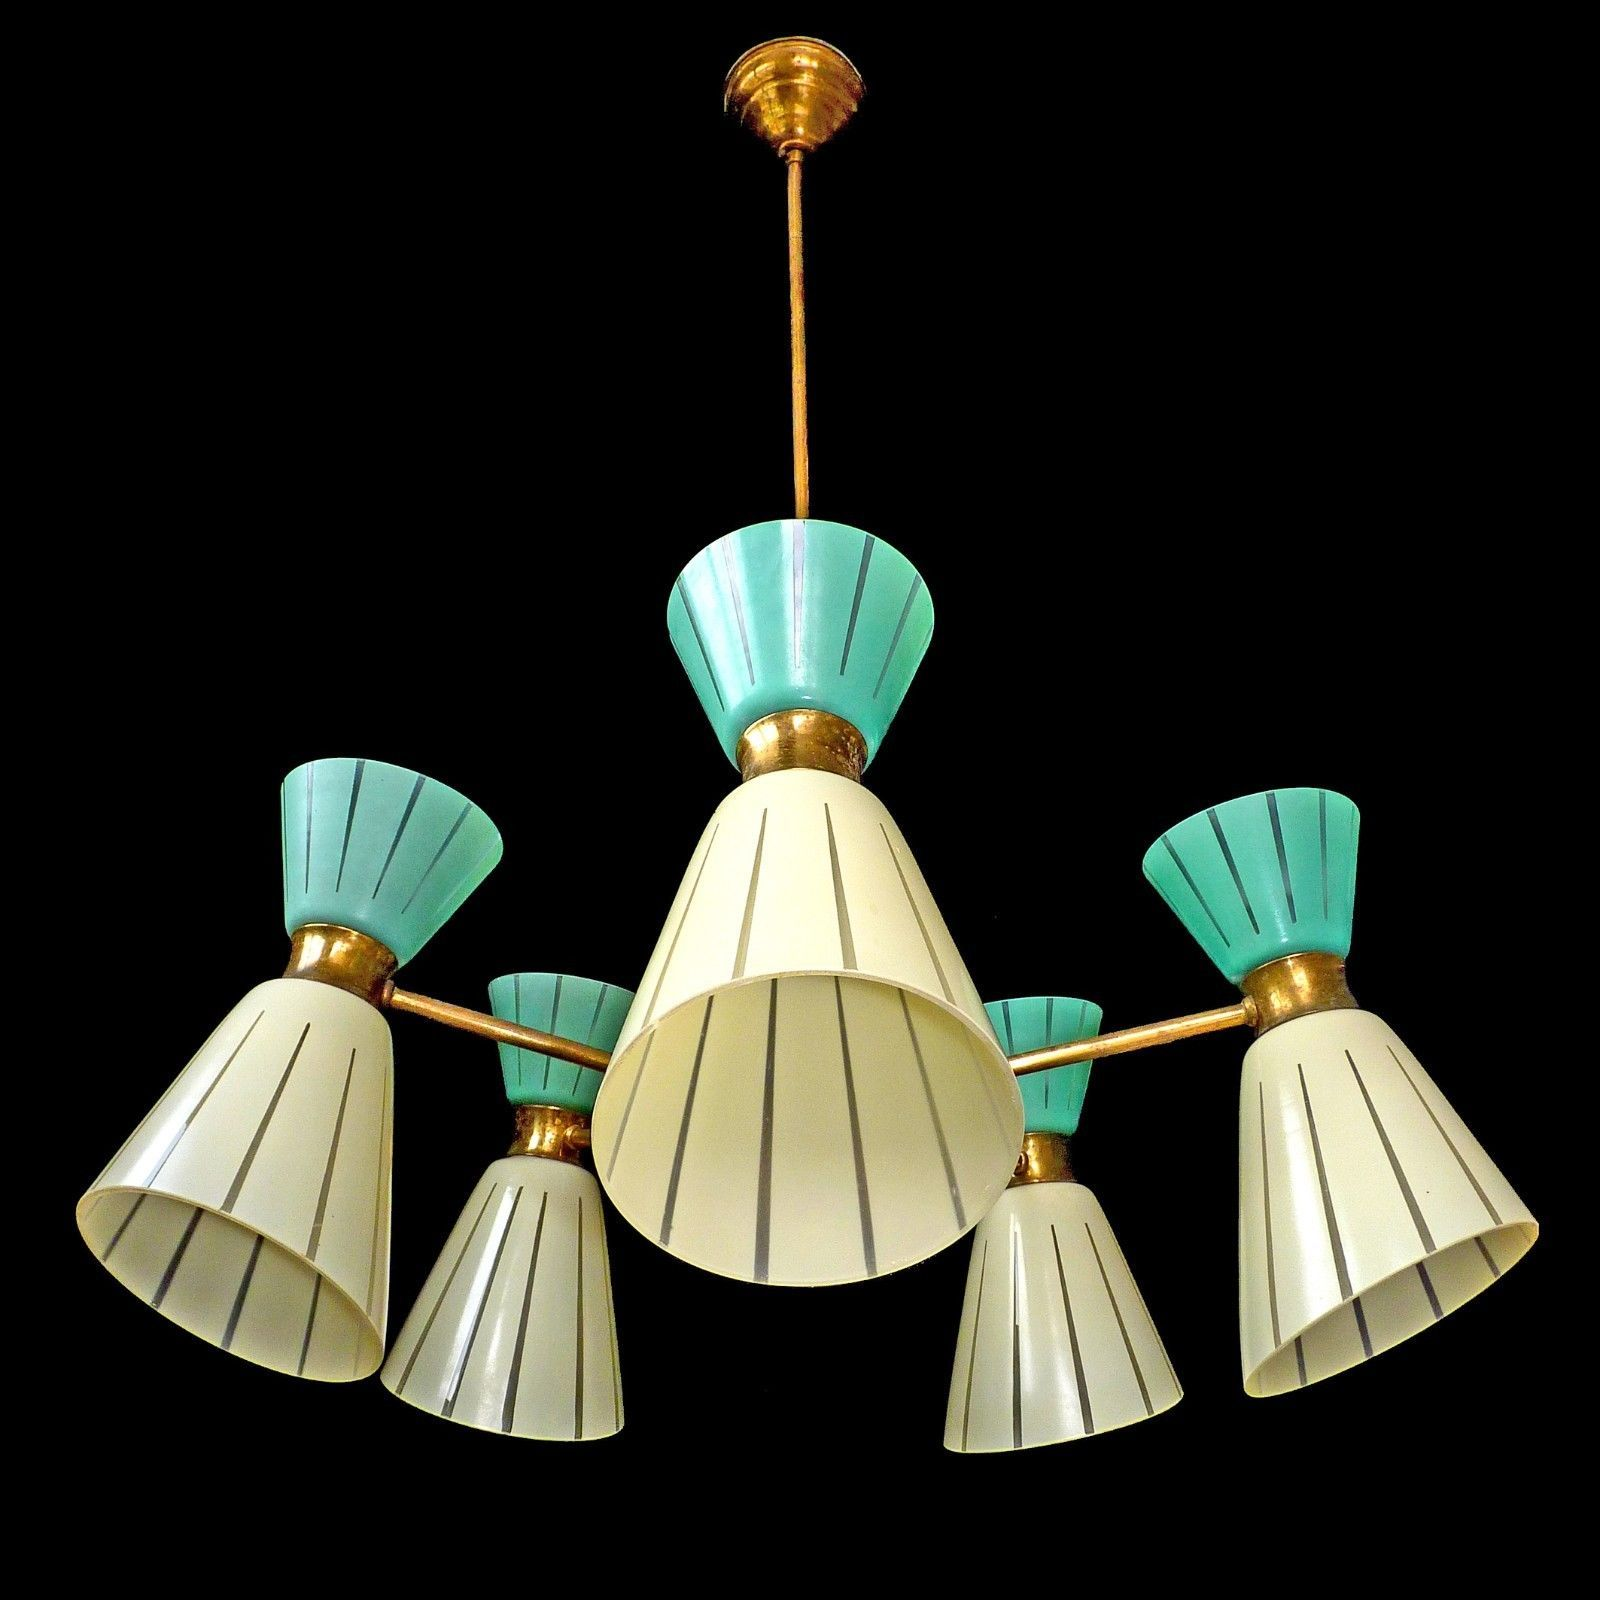 Rare 10 Light Vintage 1960 Mid-Century Italian Modernist Stilnovo ...